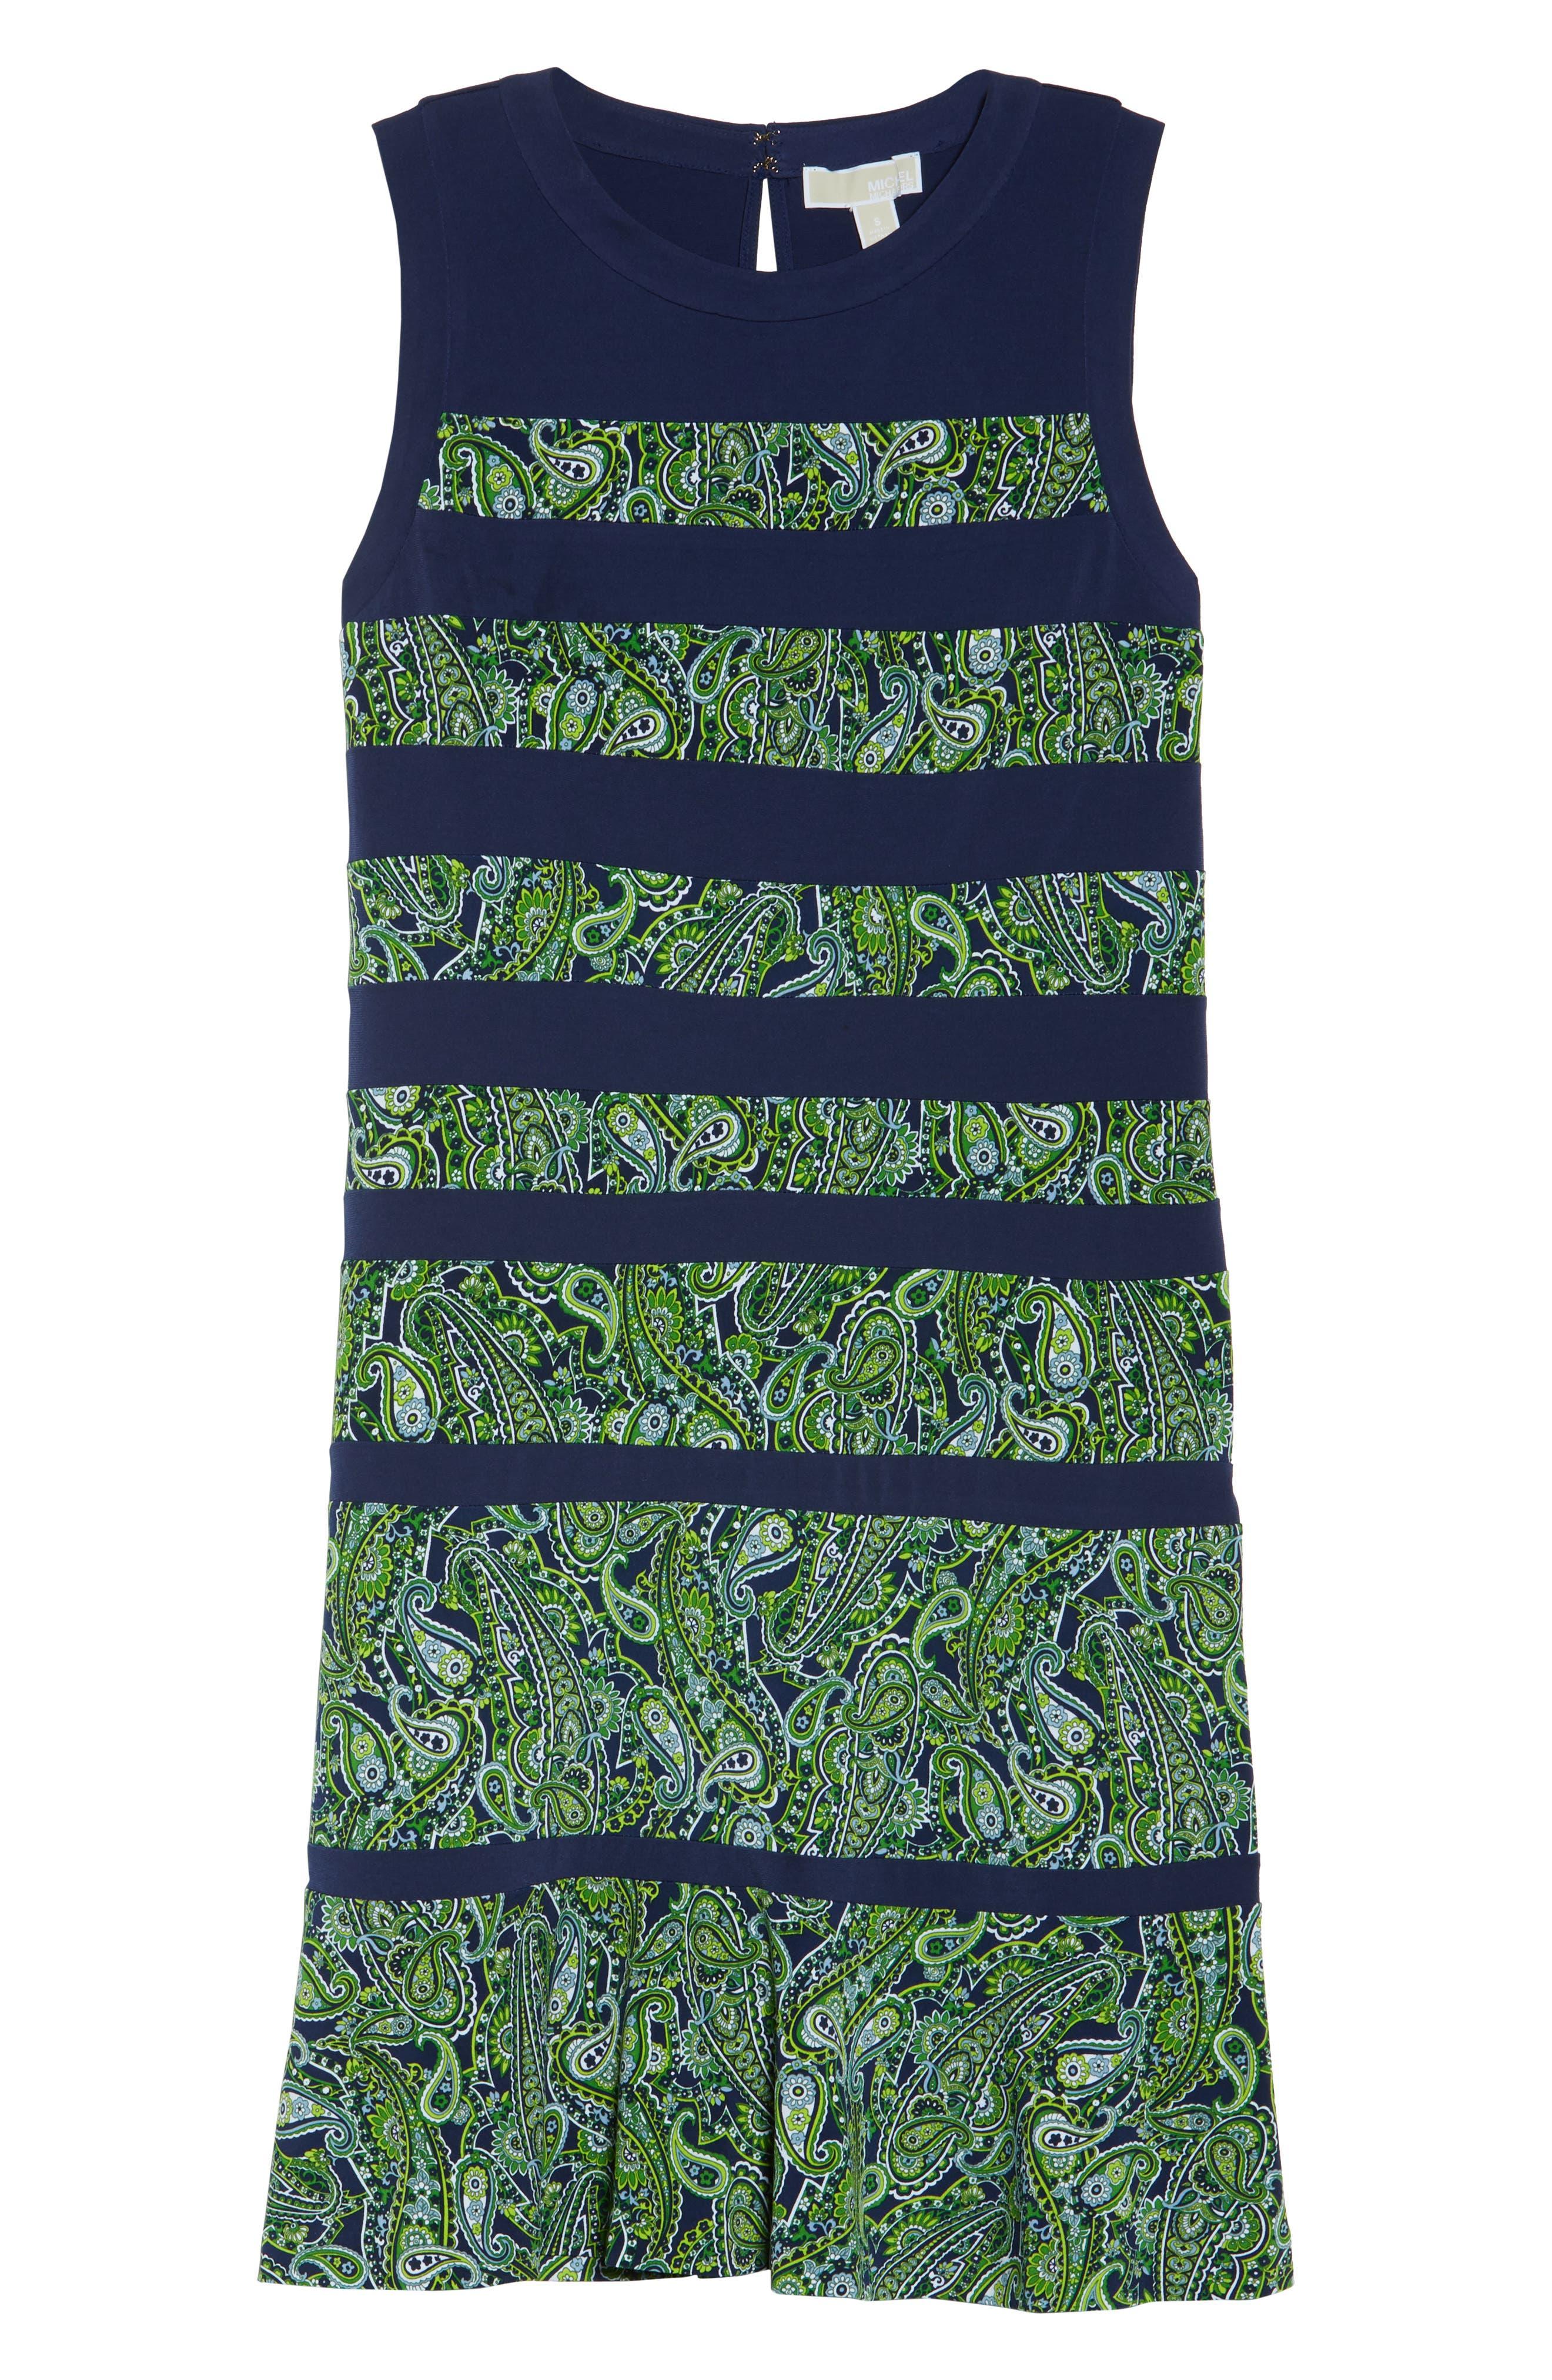 Paisley Paneled Dress,                             Alternate thumbnail 6, color,                             True Navy/ Green Apple Mu